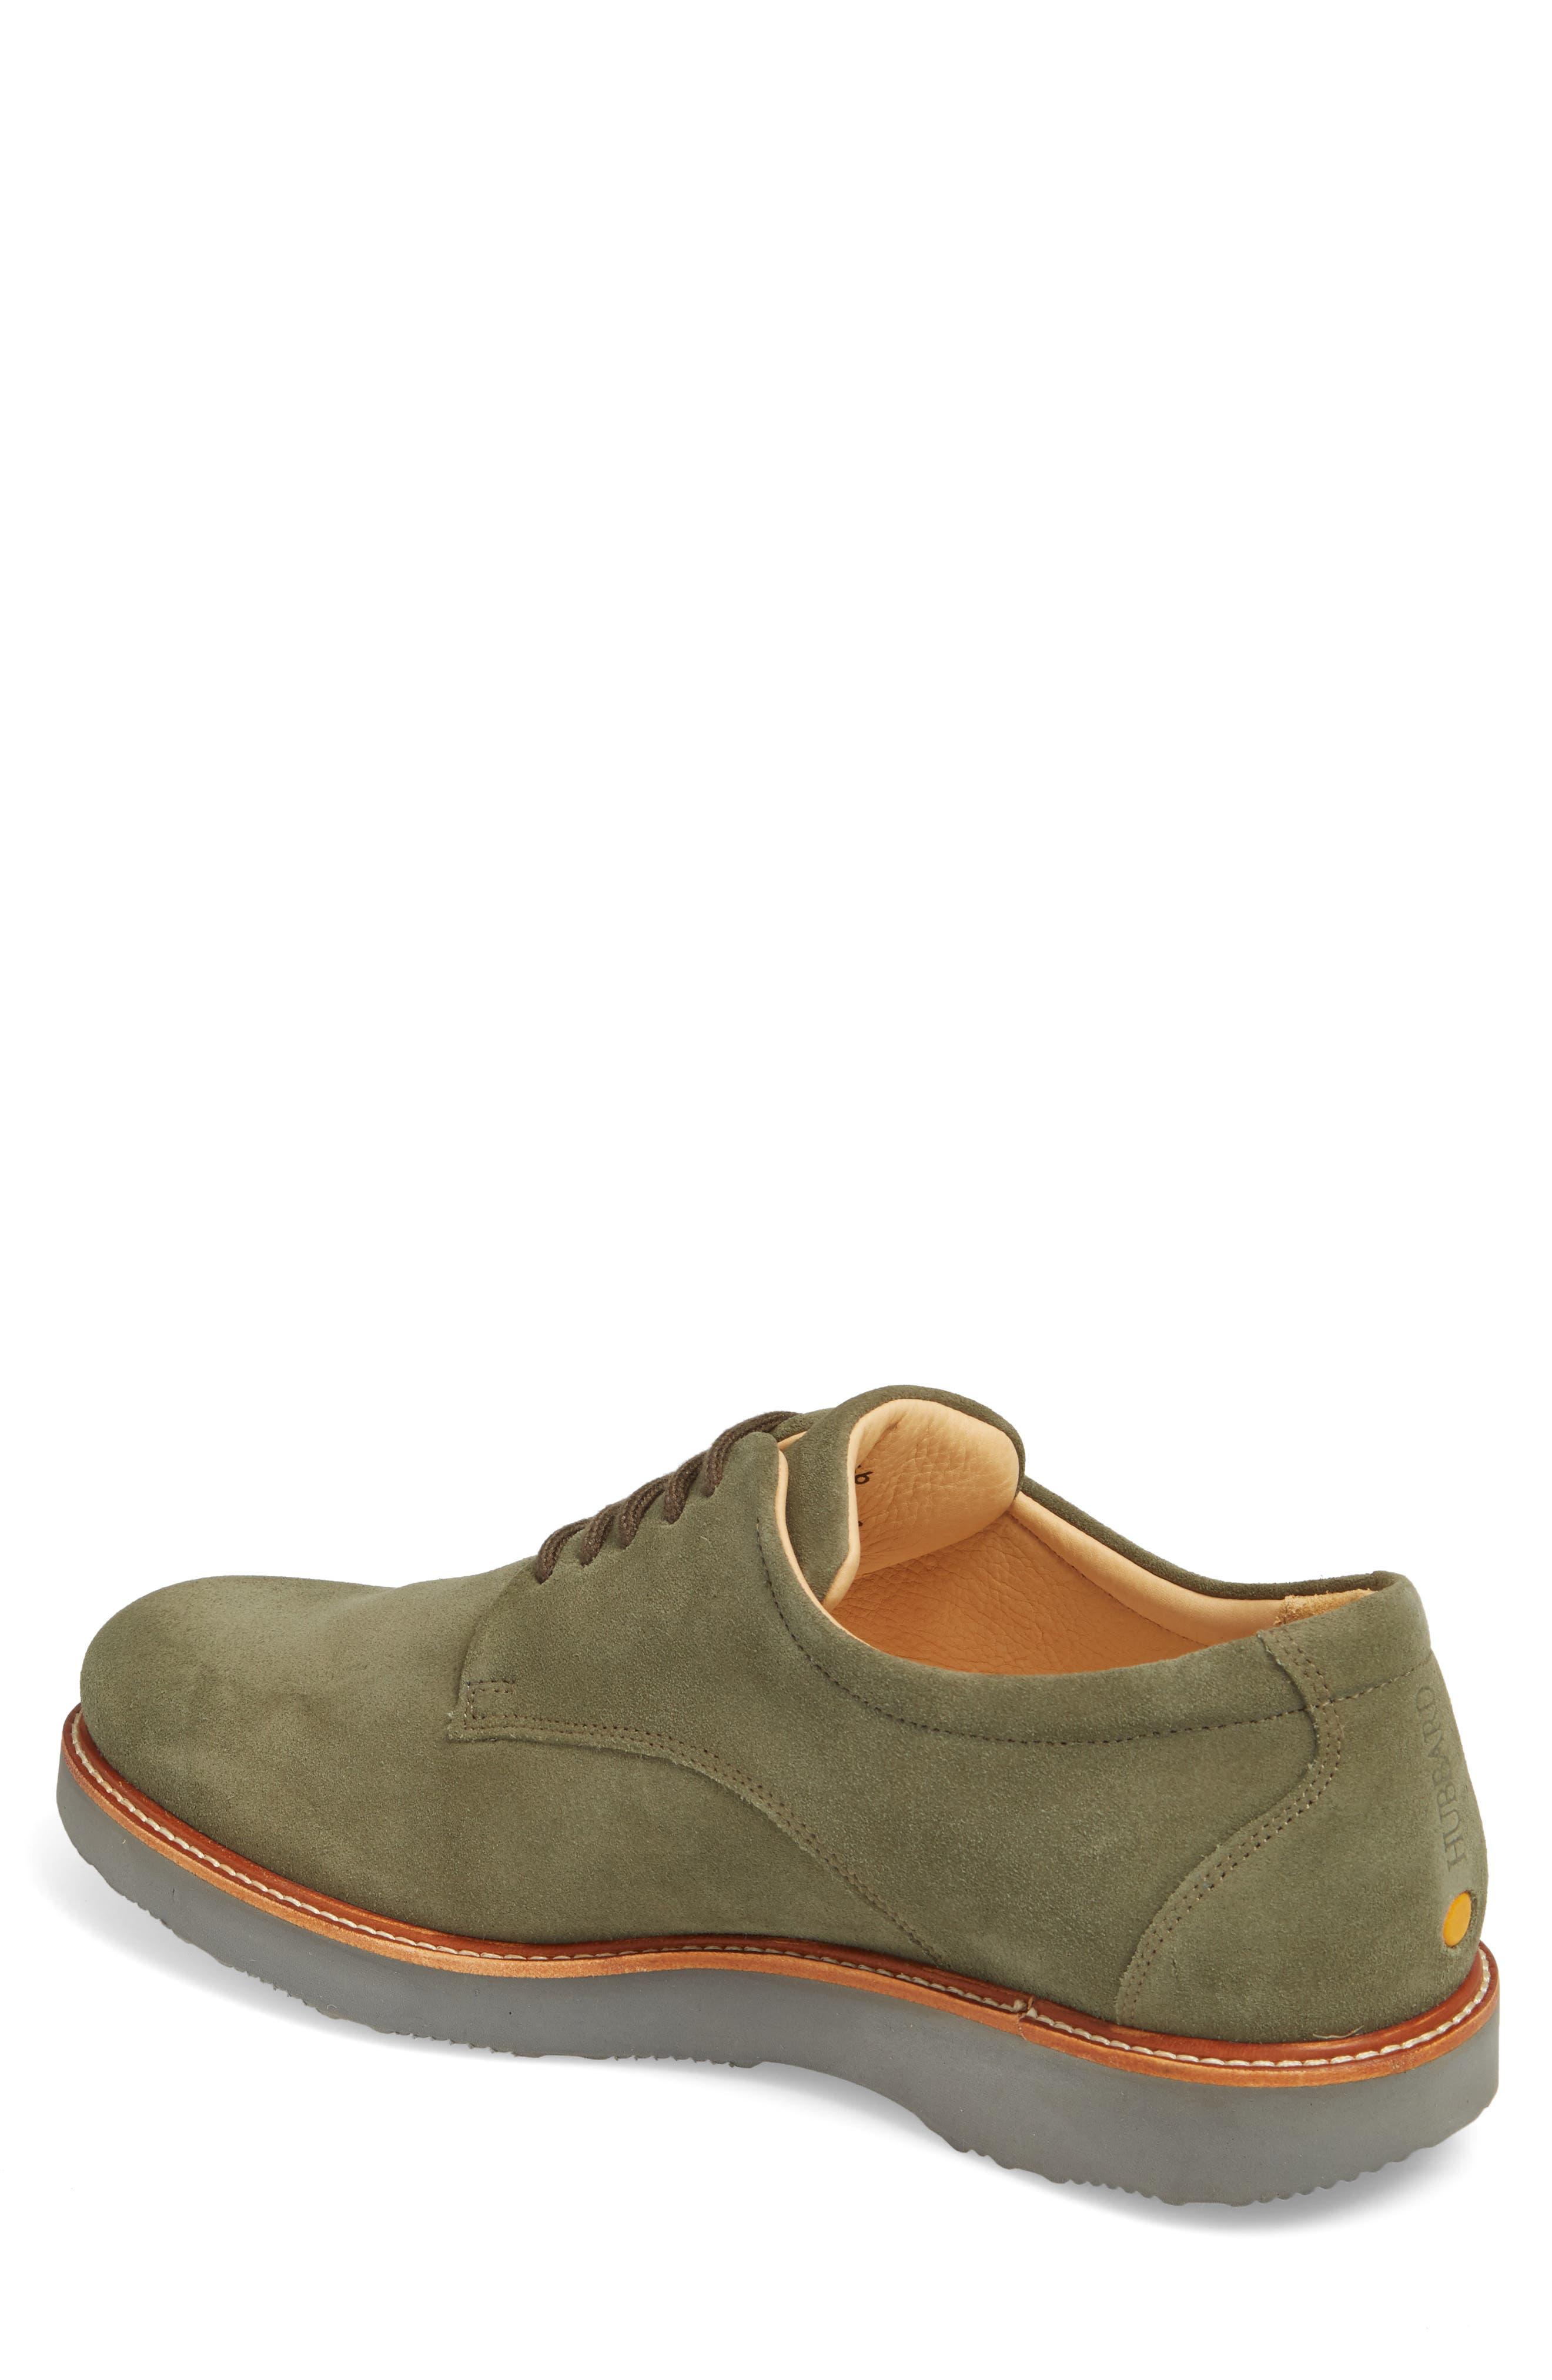 The Bucks Plain Toe Derby,                             Alternate thumbnail 2, color,                             Moss Suede